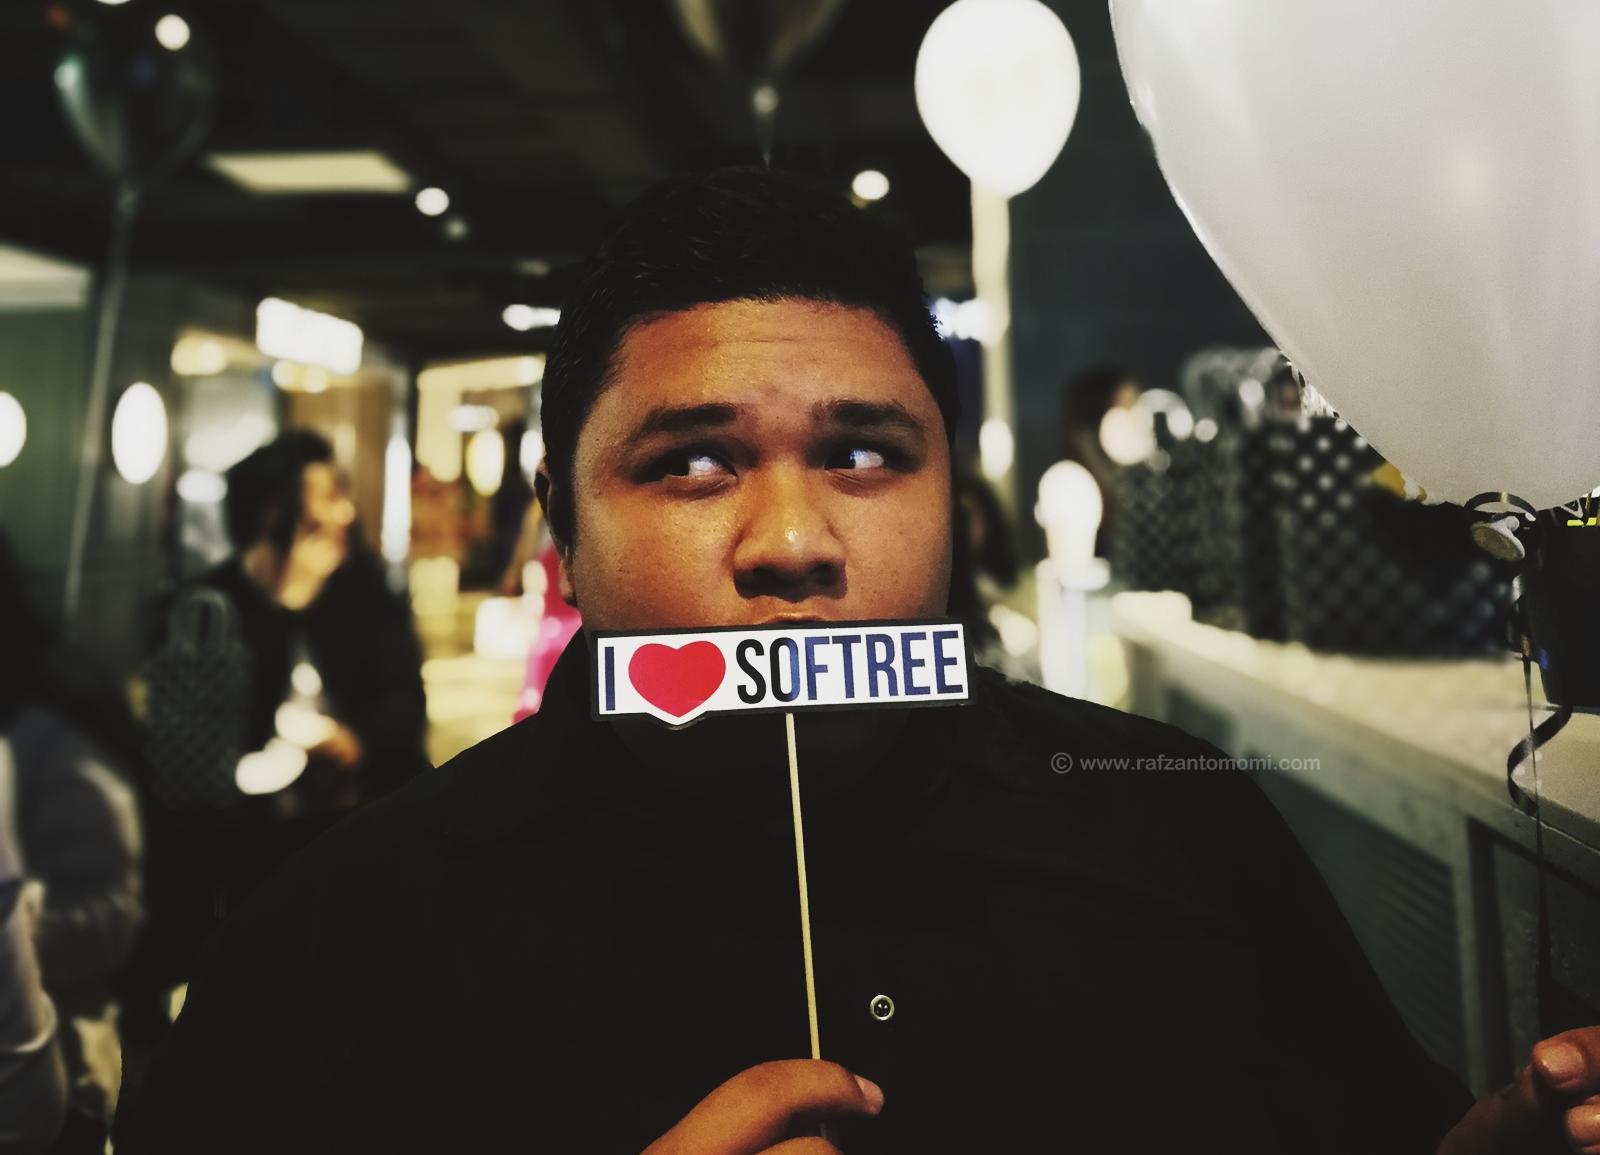 Softree Malaysia - Aiskrim Susu Organik & madu Asli Kini Tiba Di Malaysia